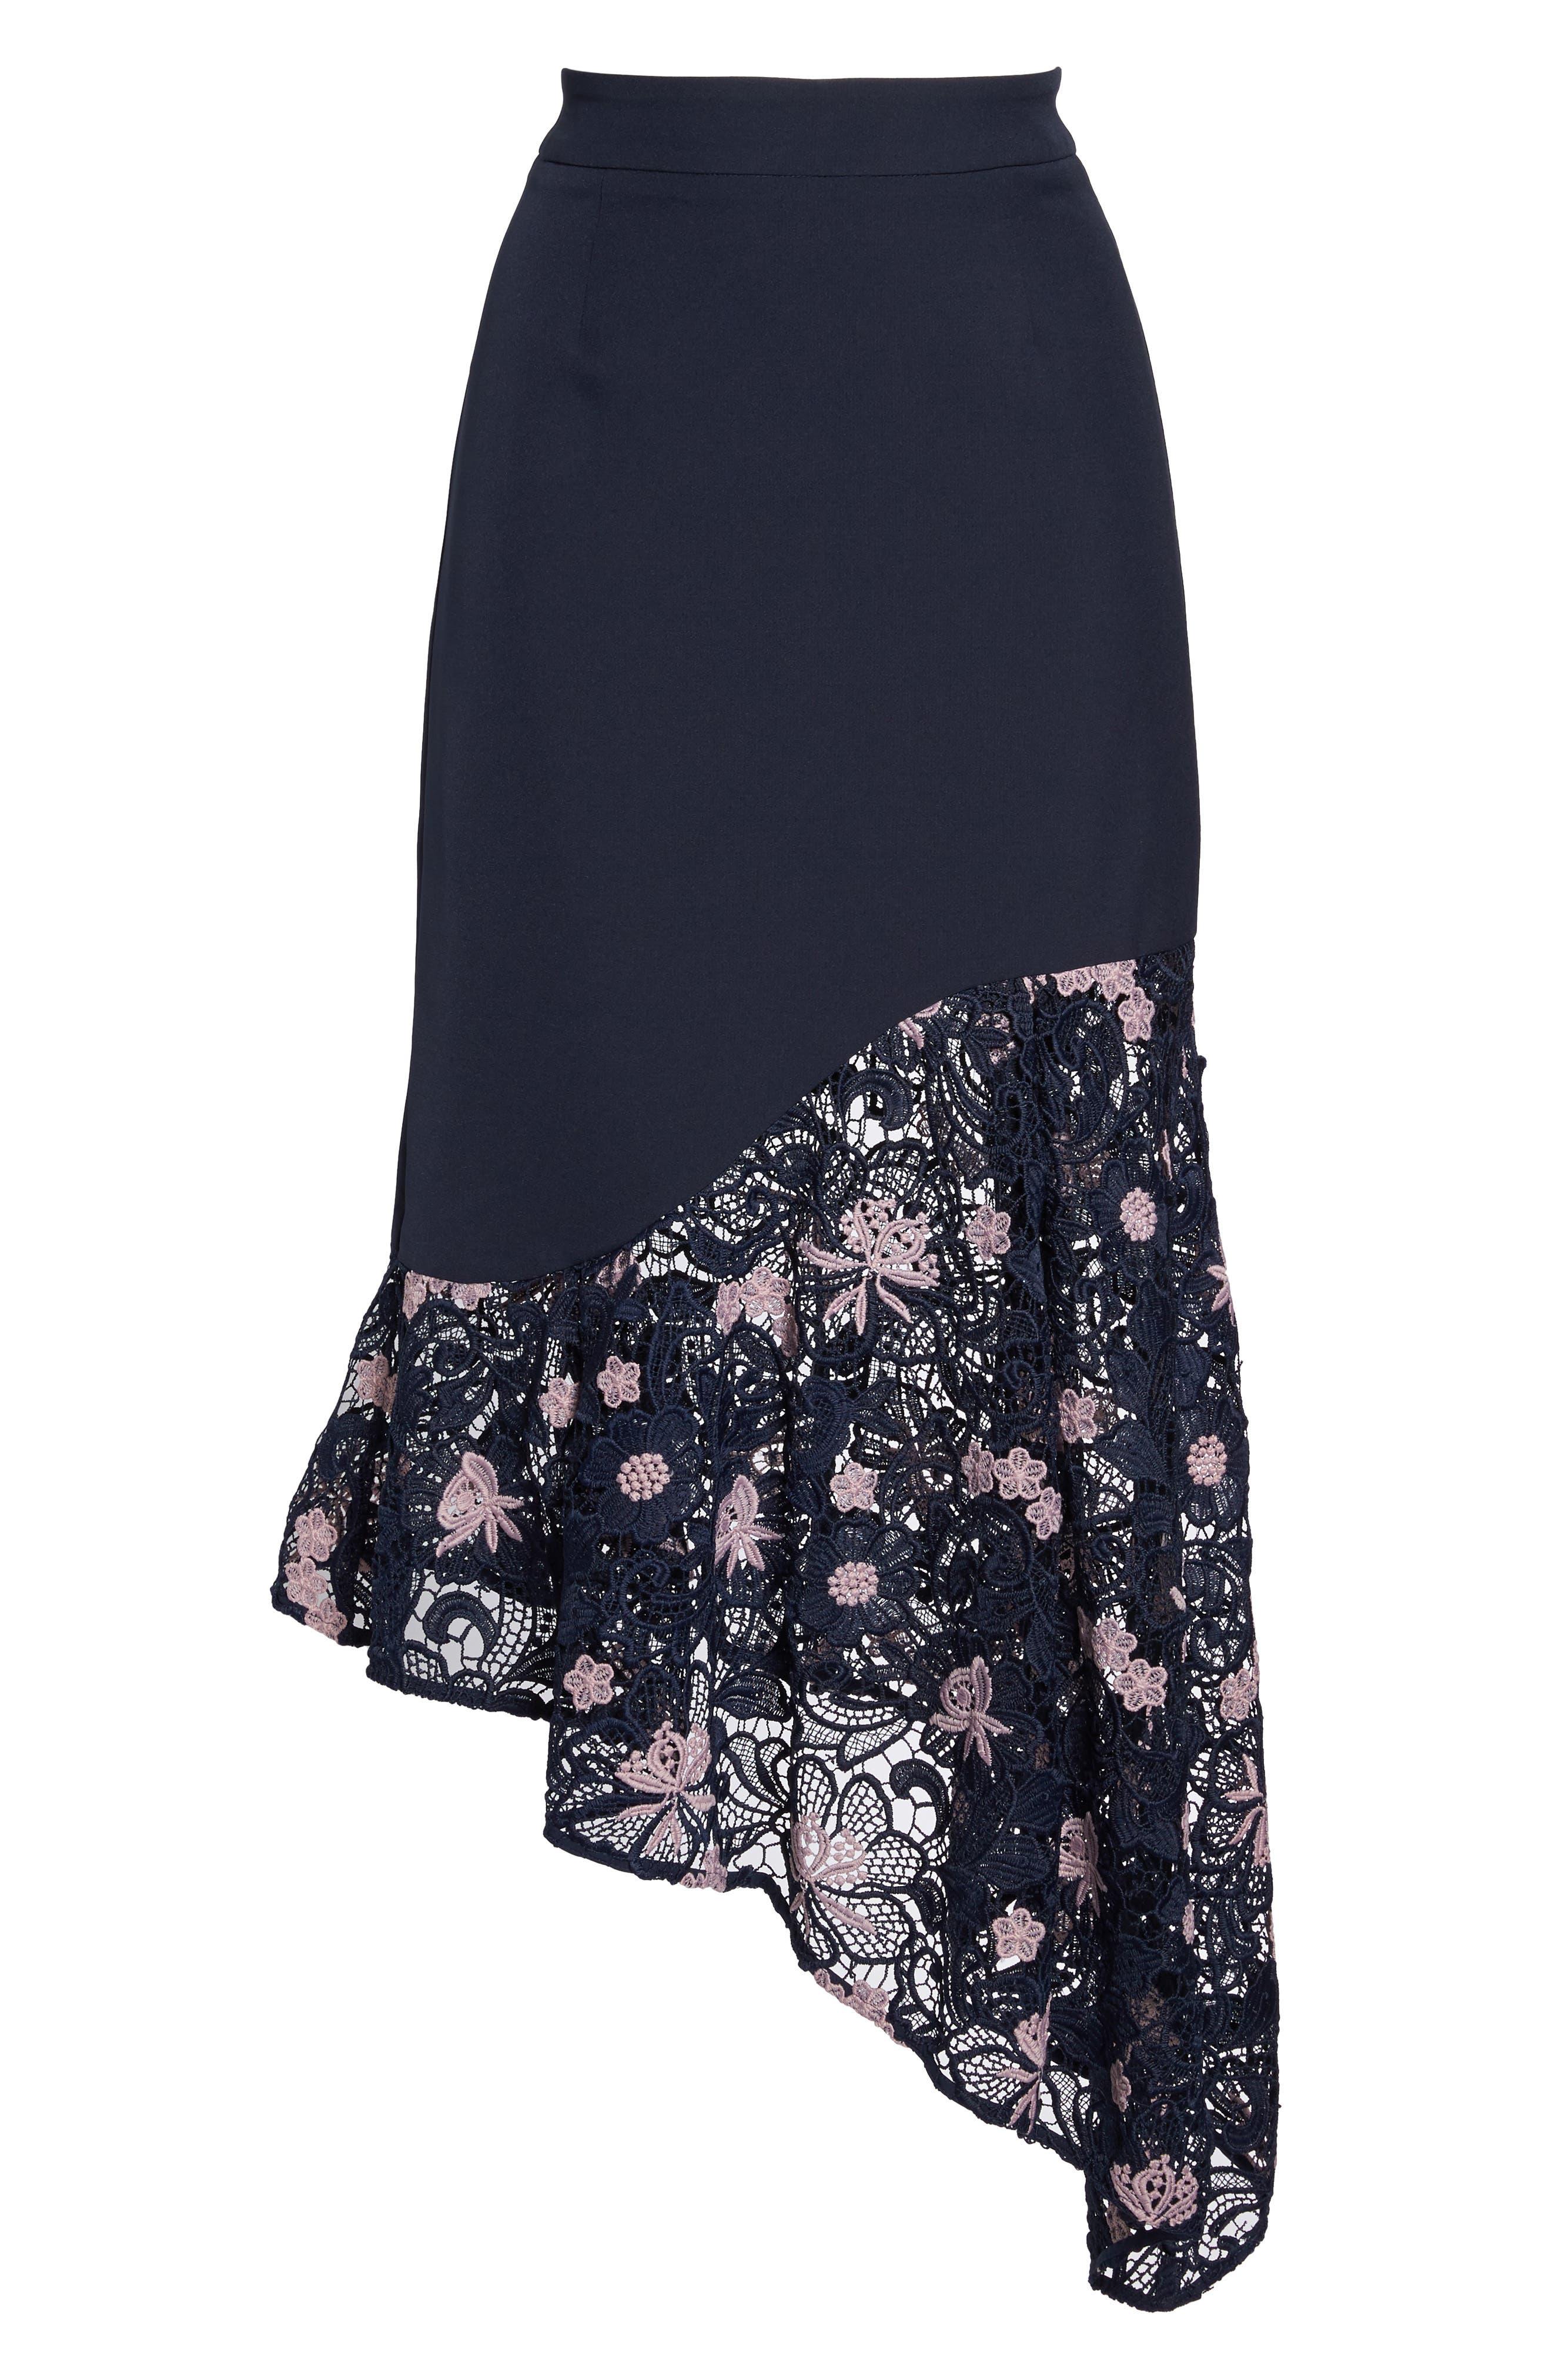 Botanic Bloom Lace Asymmetric Skirt,                             Alternate thumbnail 6, color,                             413